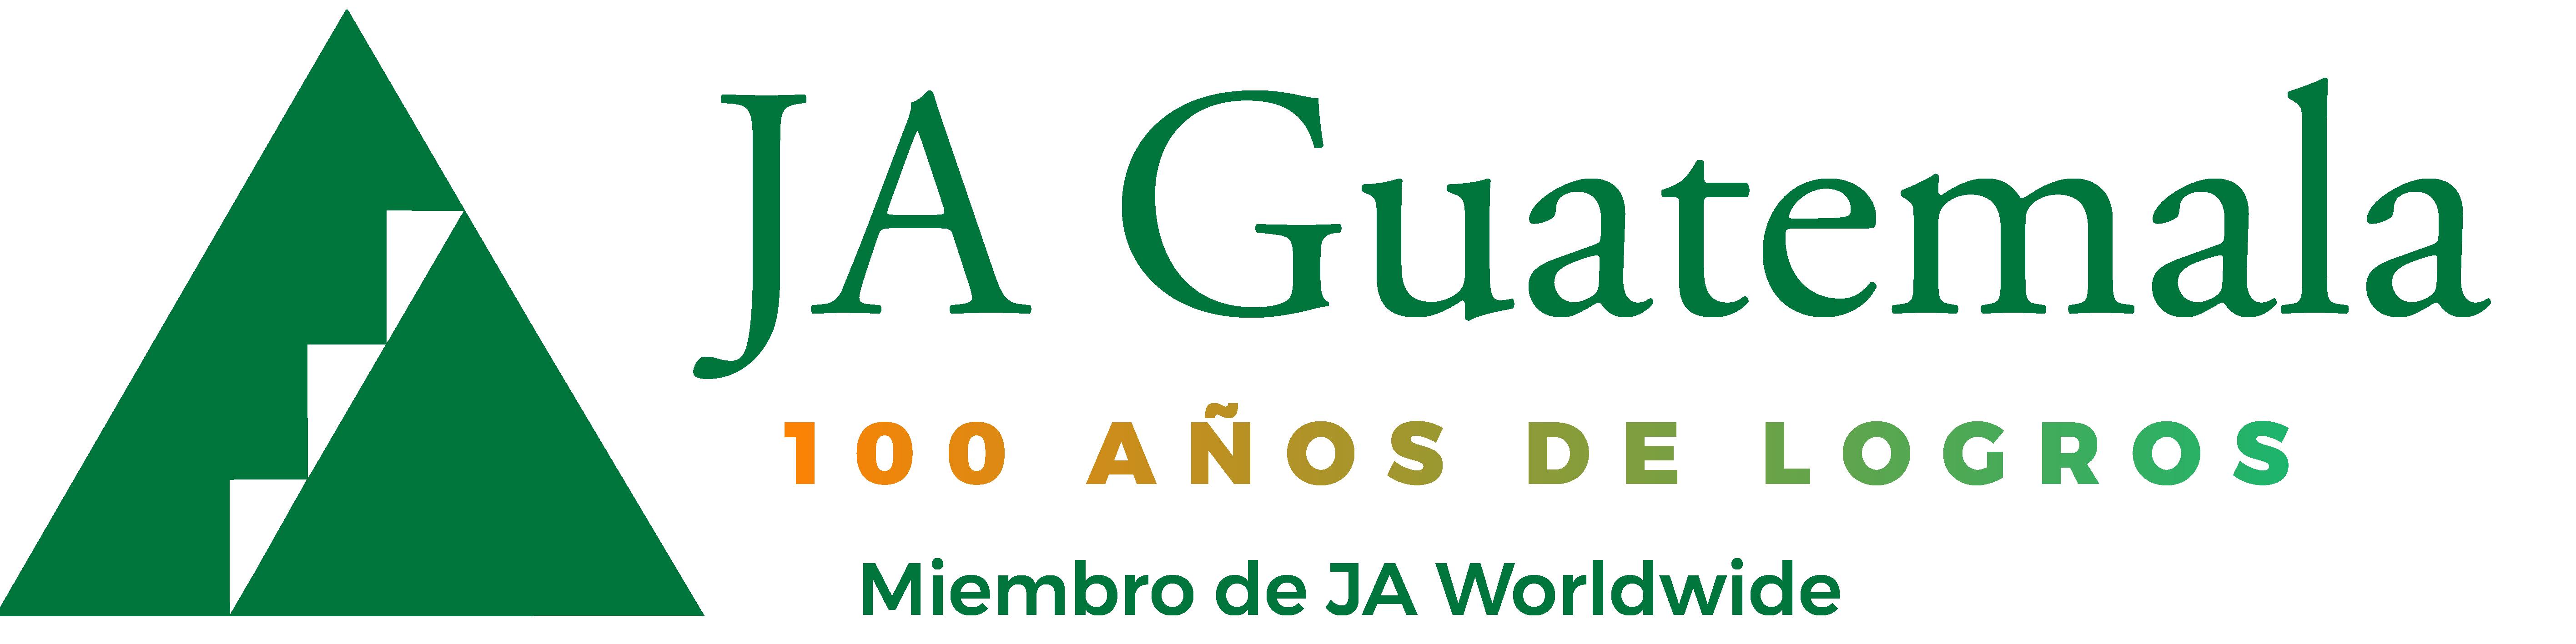 JA Guatemala